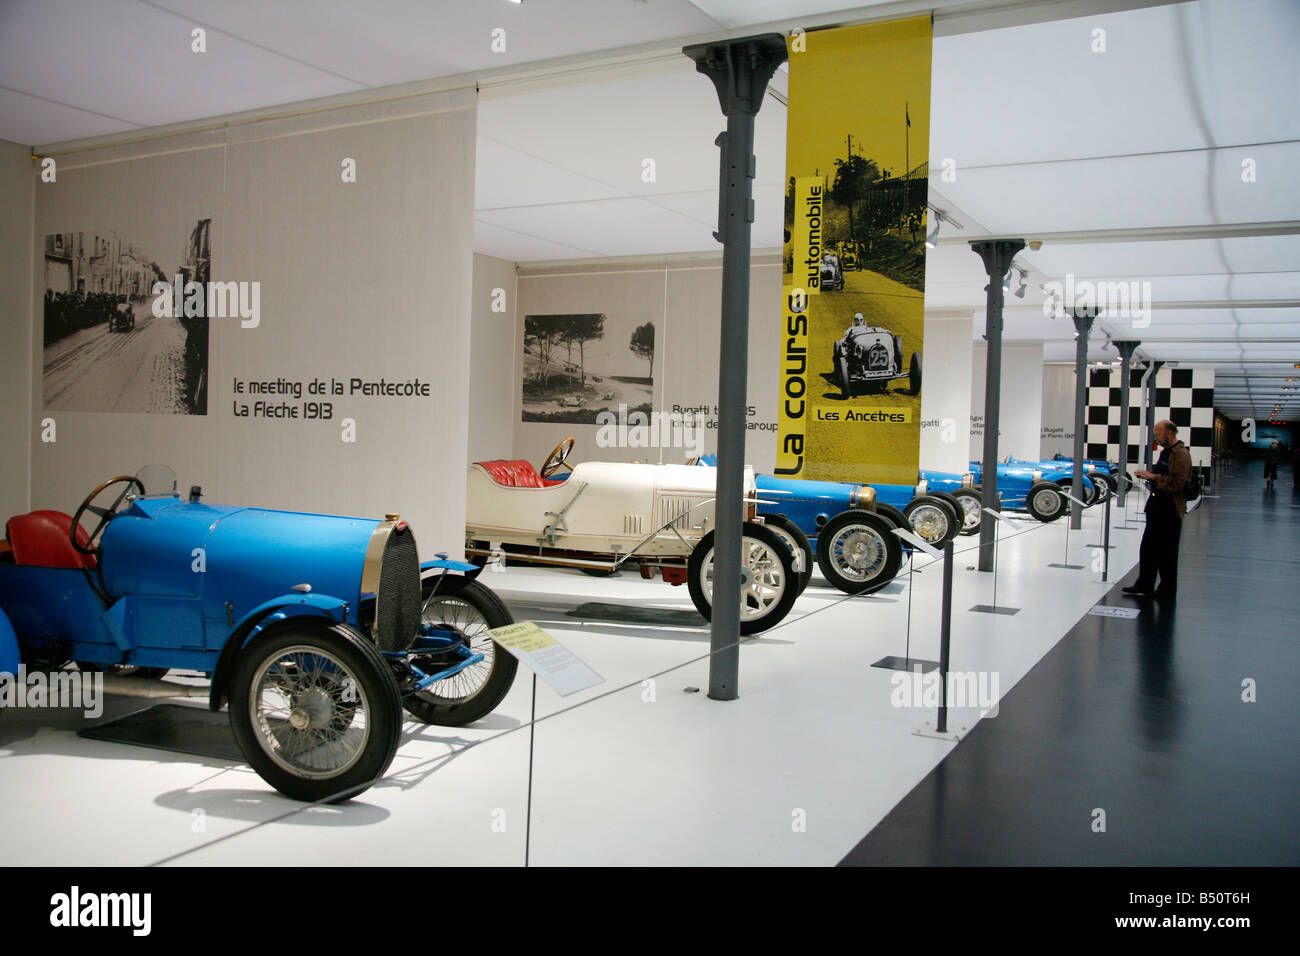 Sep 2008 - Musee National de l Automobile Mulhouse Alsace France - Stock Image